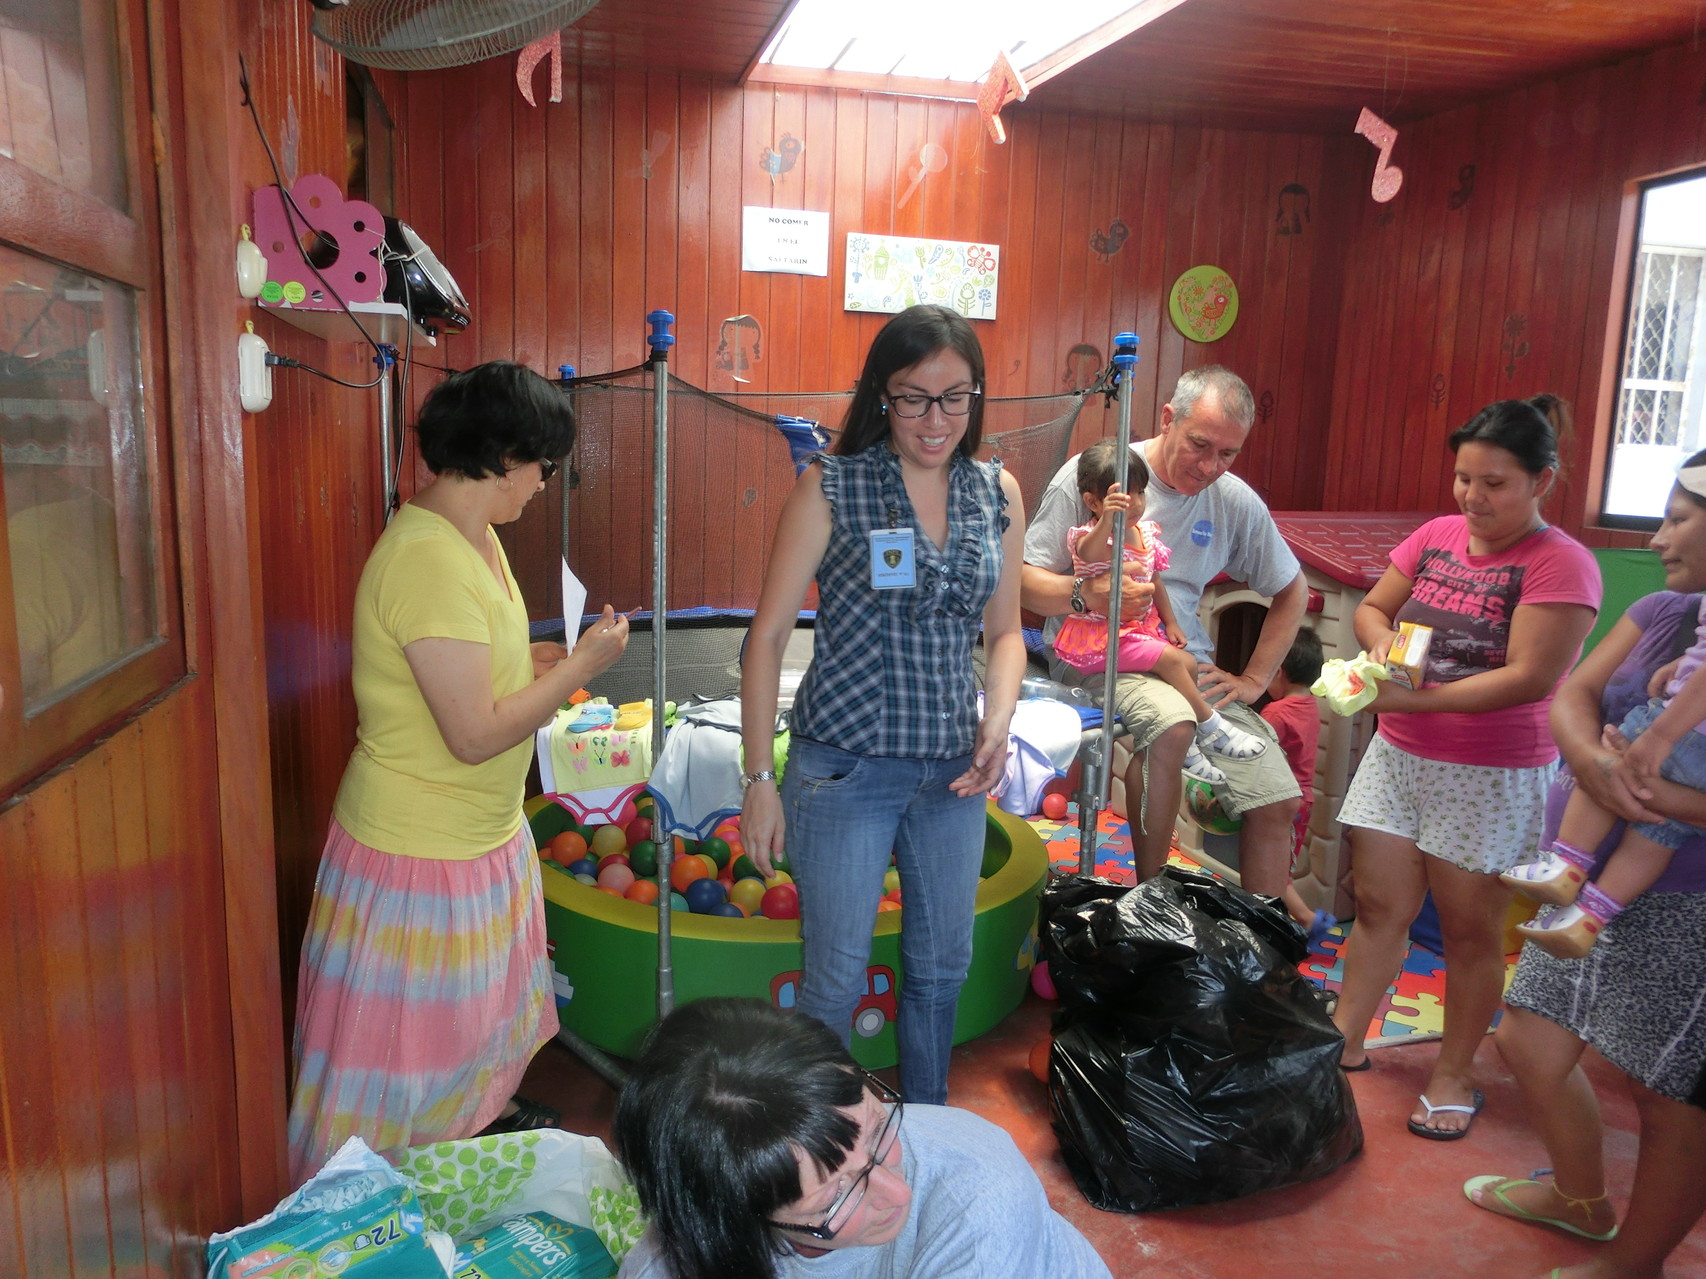 Sandra Arce, unsere helfende Hand